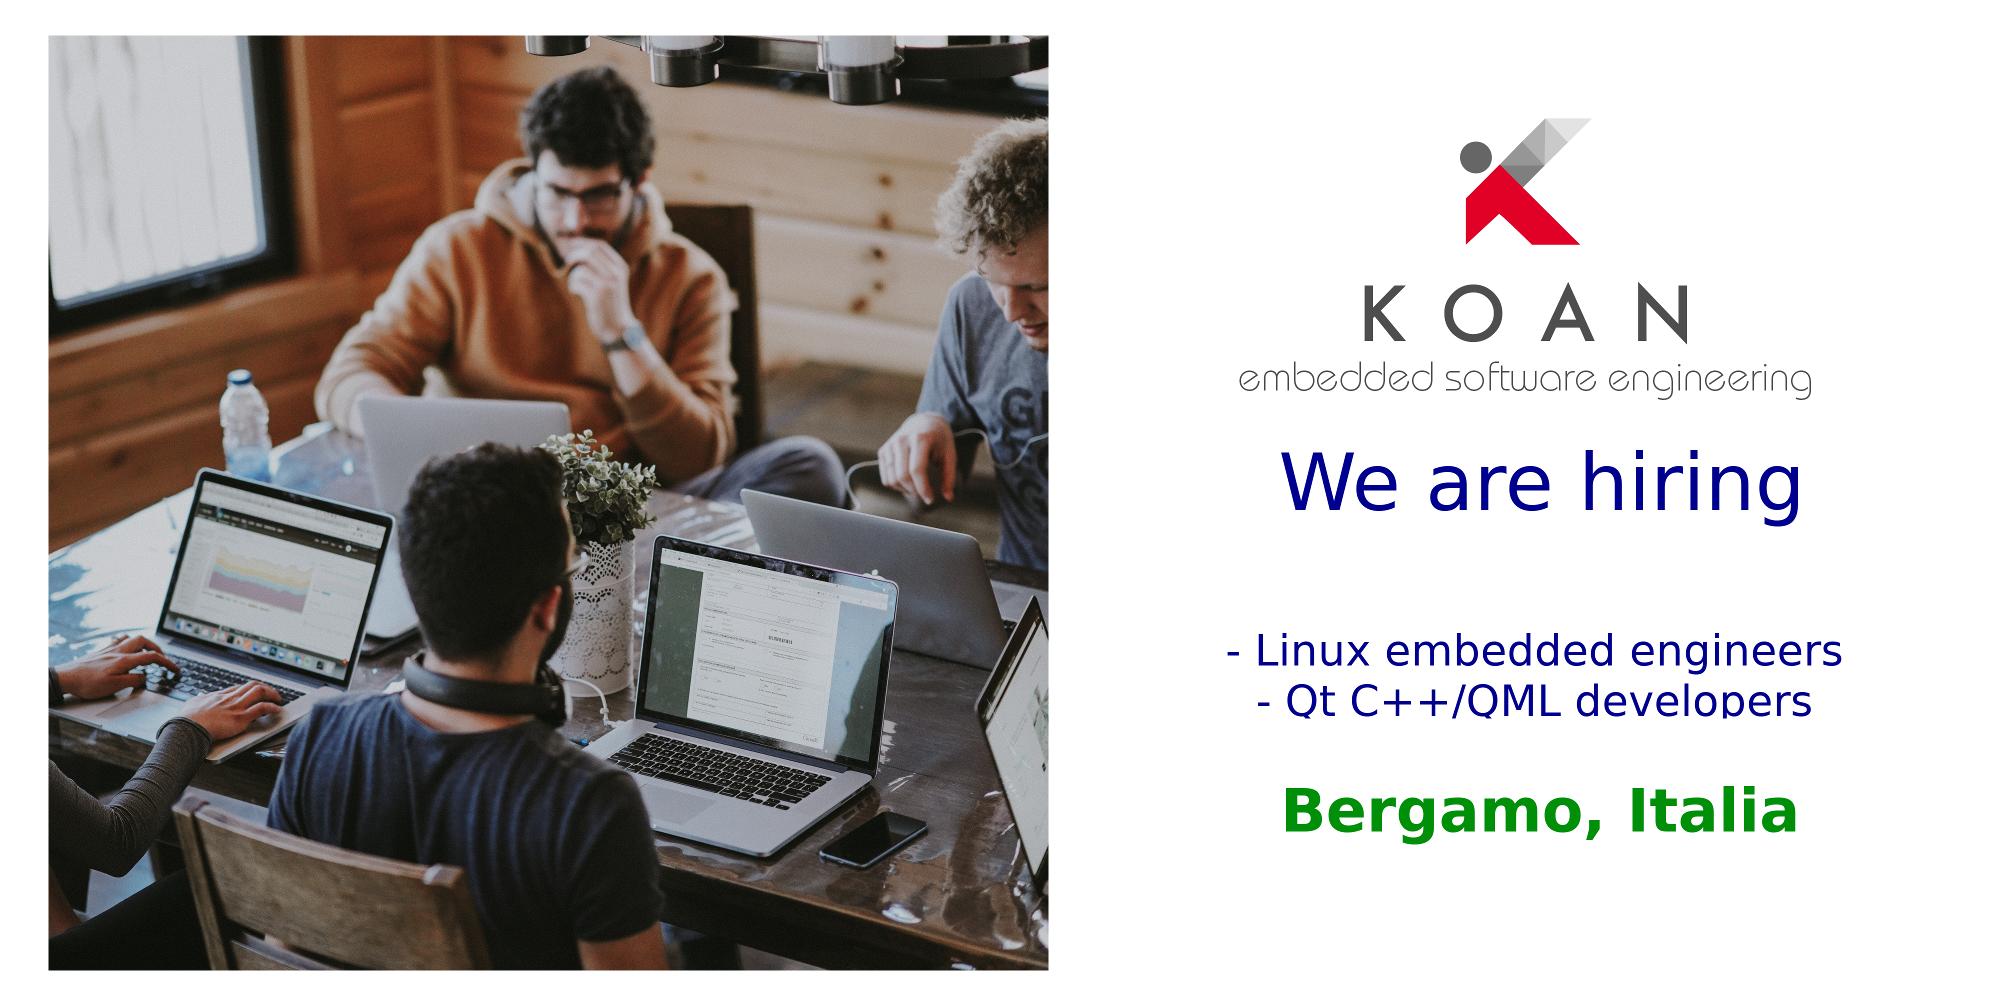 Koan hiring Linux developers